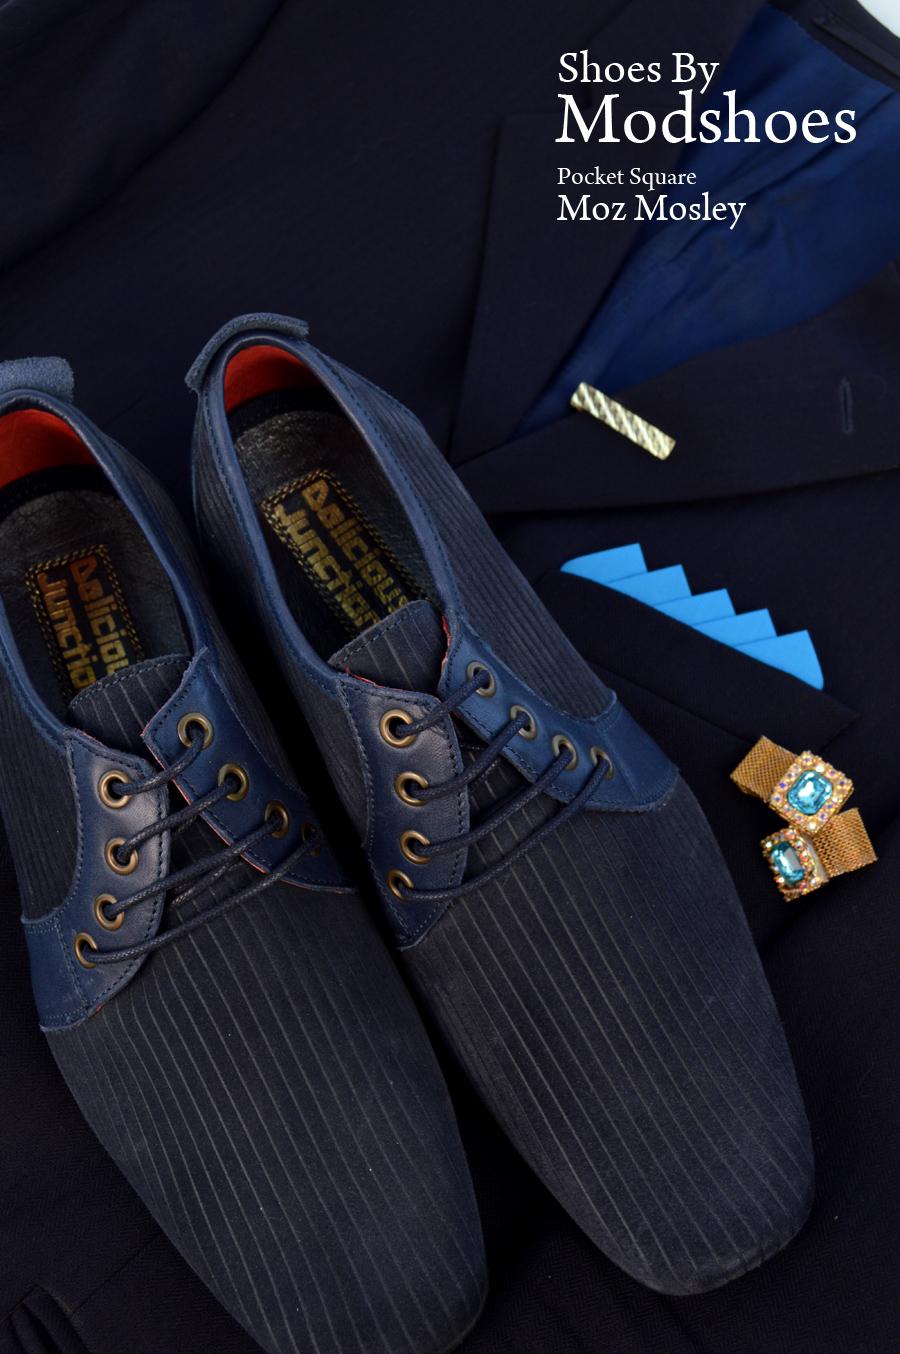 modshoes-blue-corded-shoes